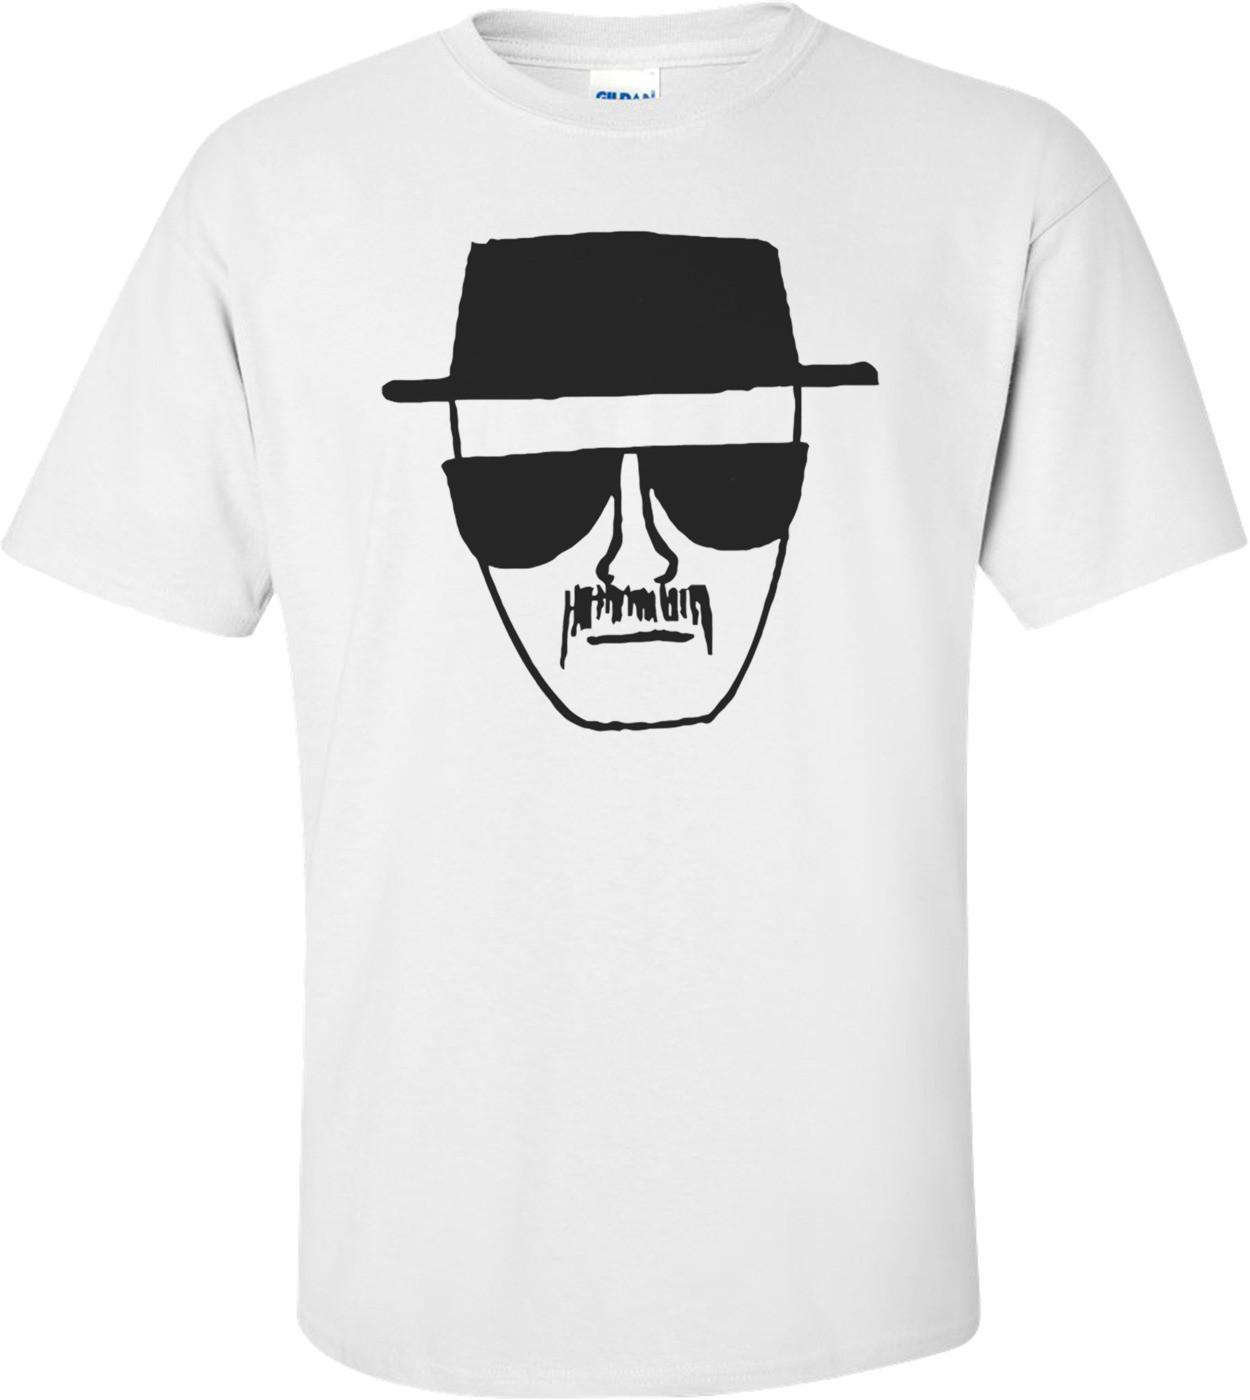 Heisenberg Cool Breaking Bad Shirt